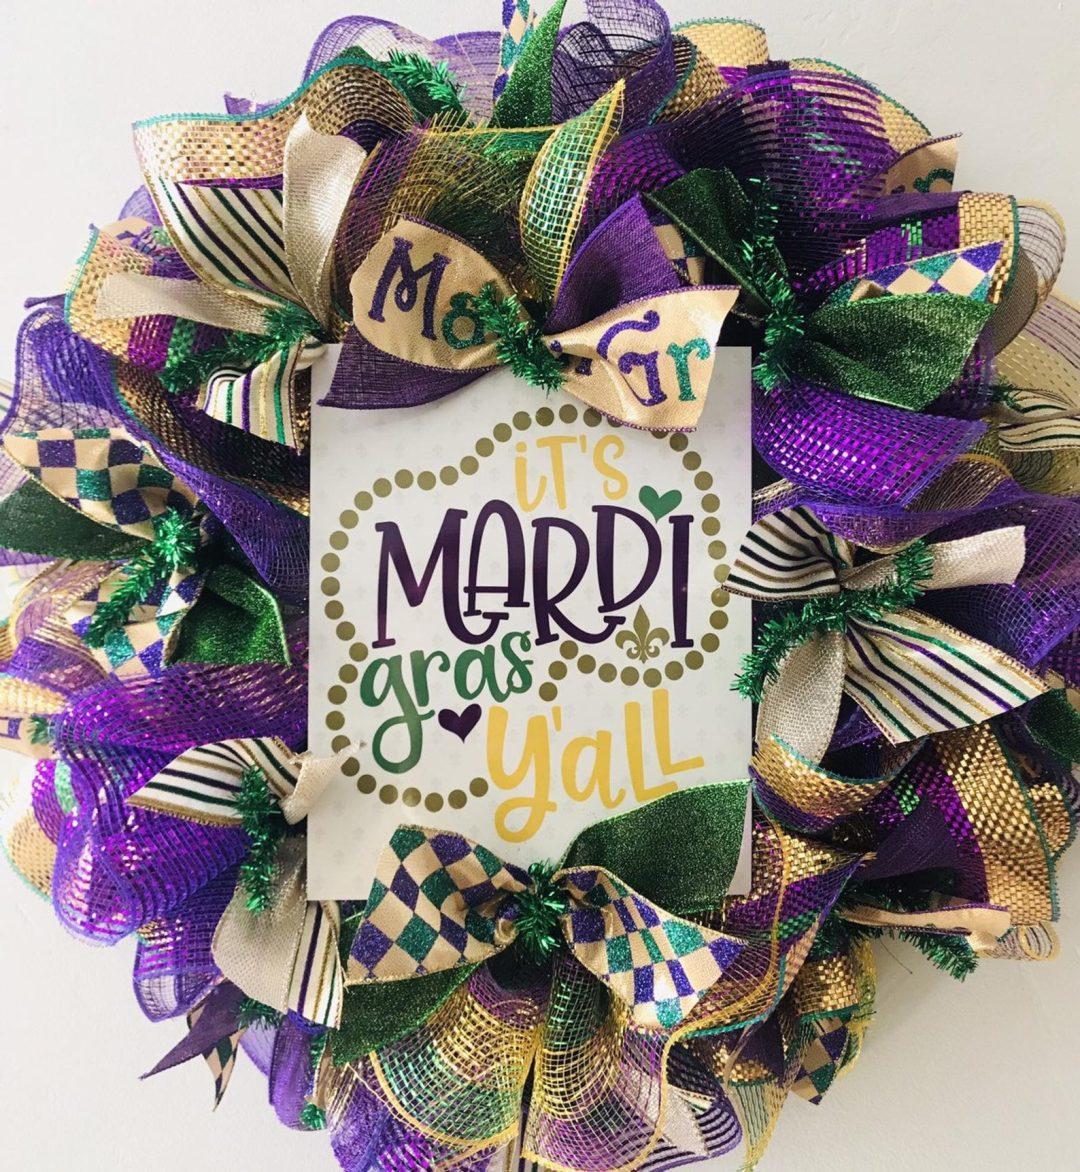 Deco mesh Mardi Gras wreaths